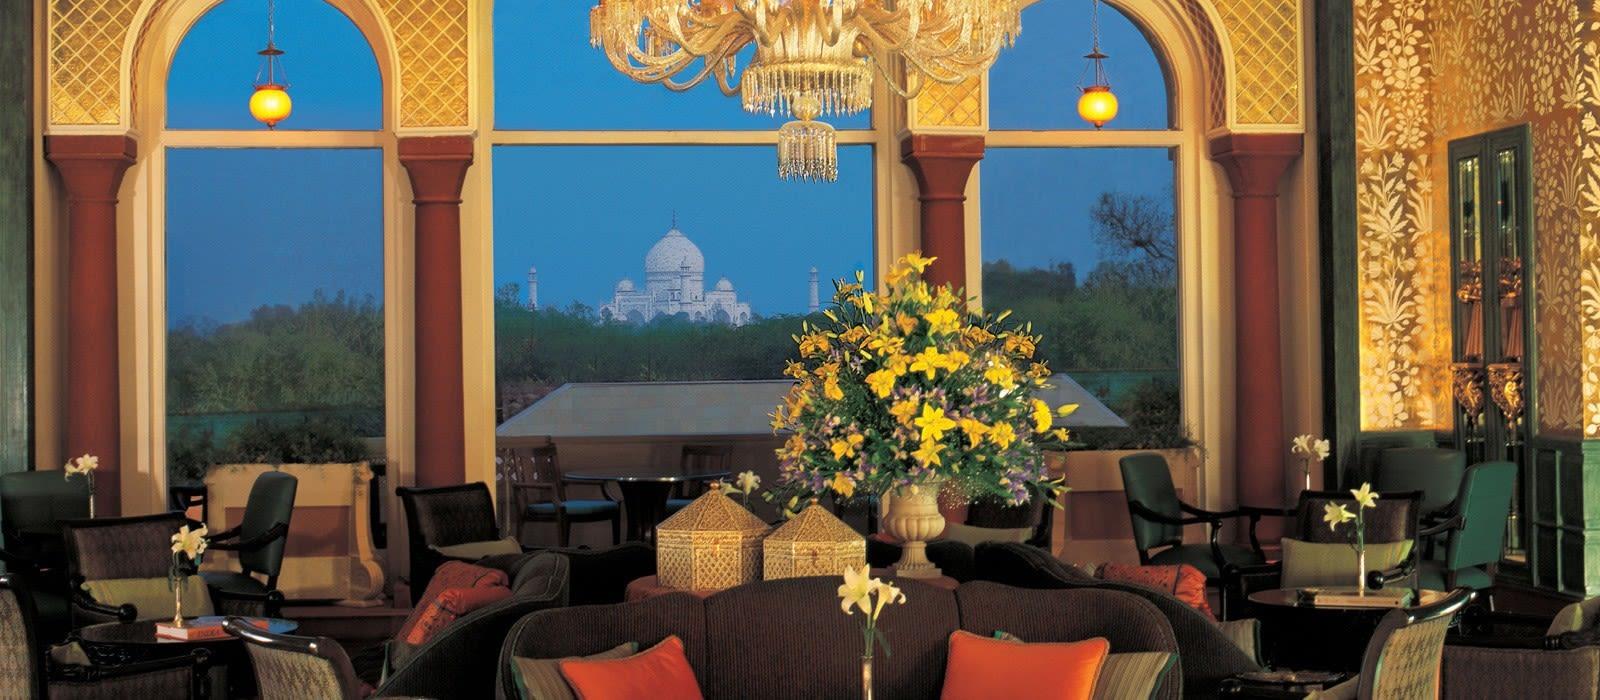 Hotel The Oberoi Amarvilas, Agra North India